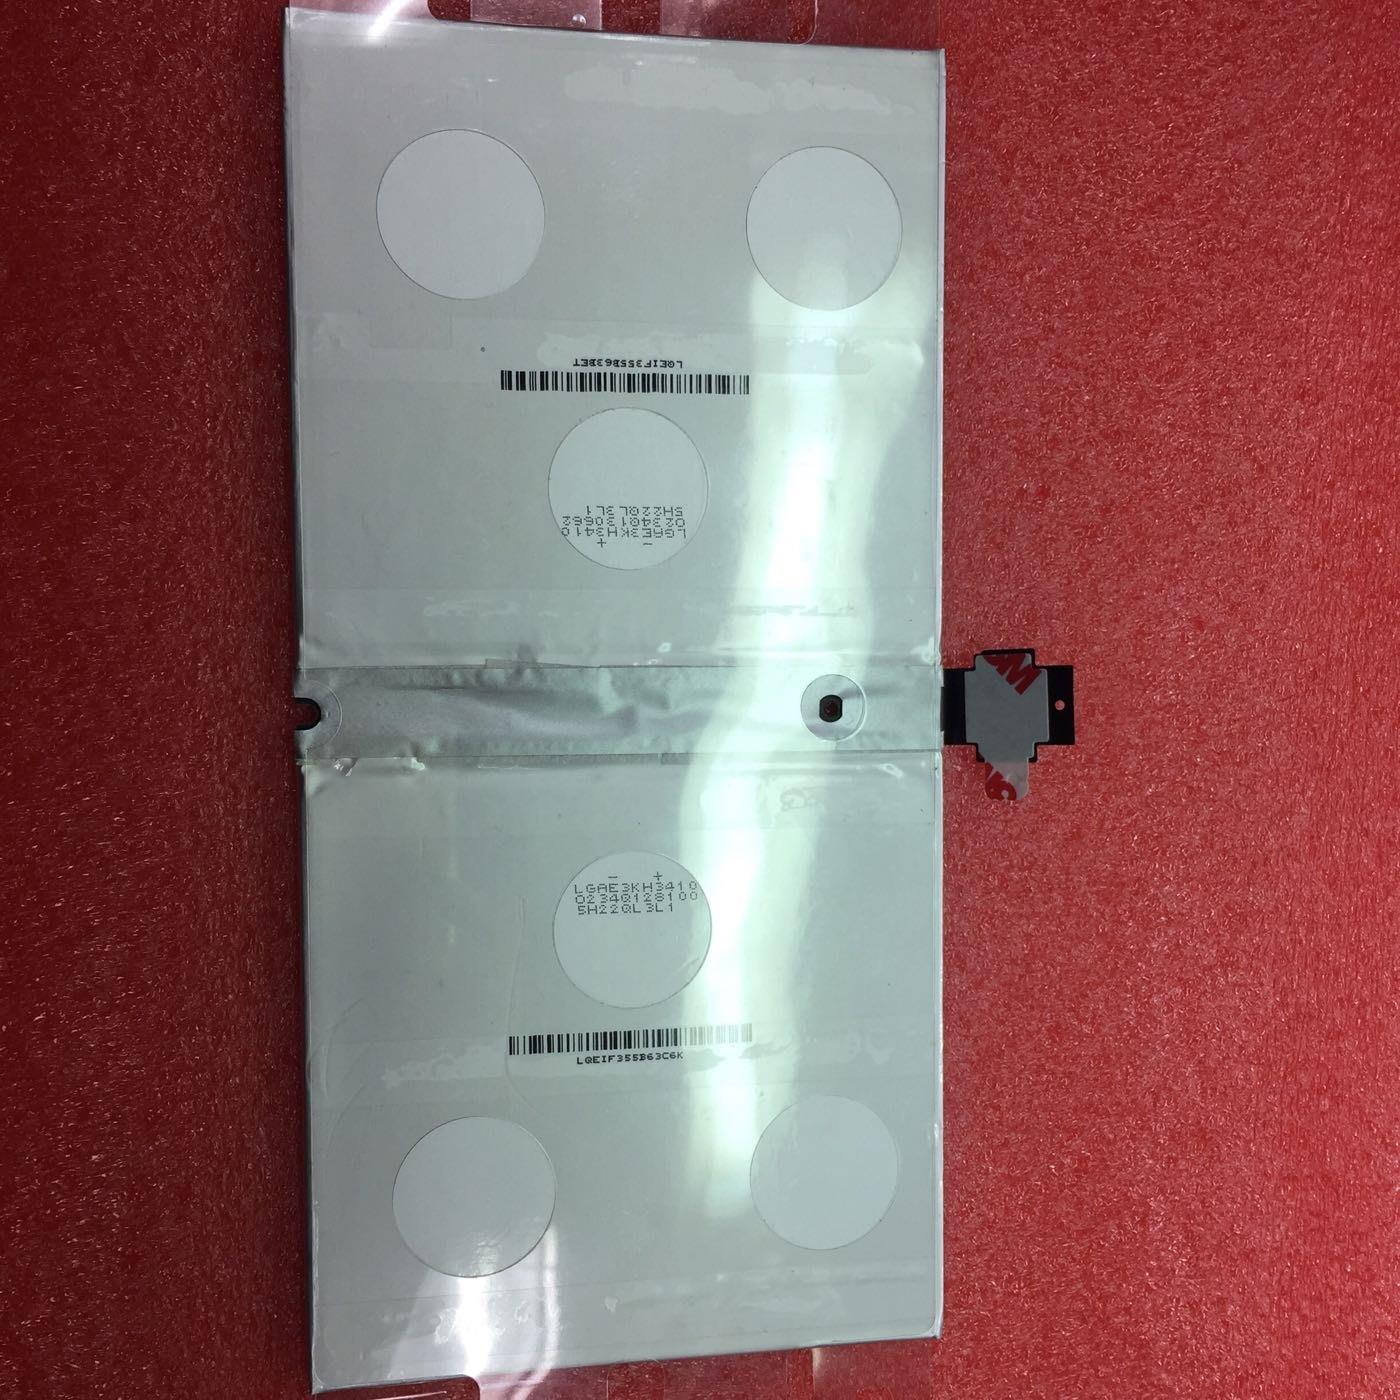 pro4電池 微軟 Surface pro 4 1724 平板電腦 G3HTA027H DYNRO01